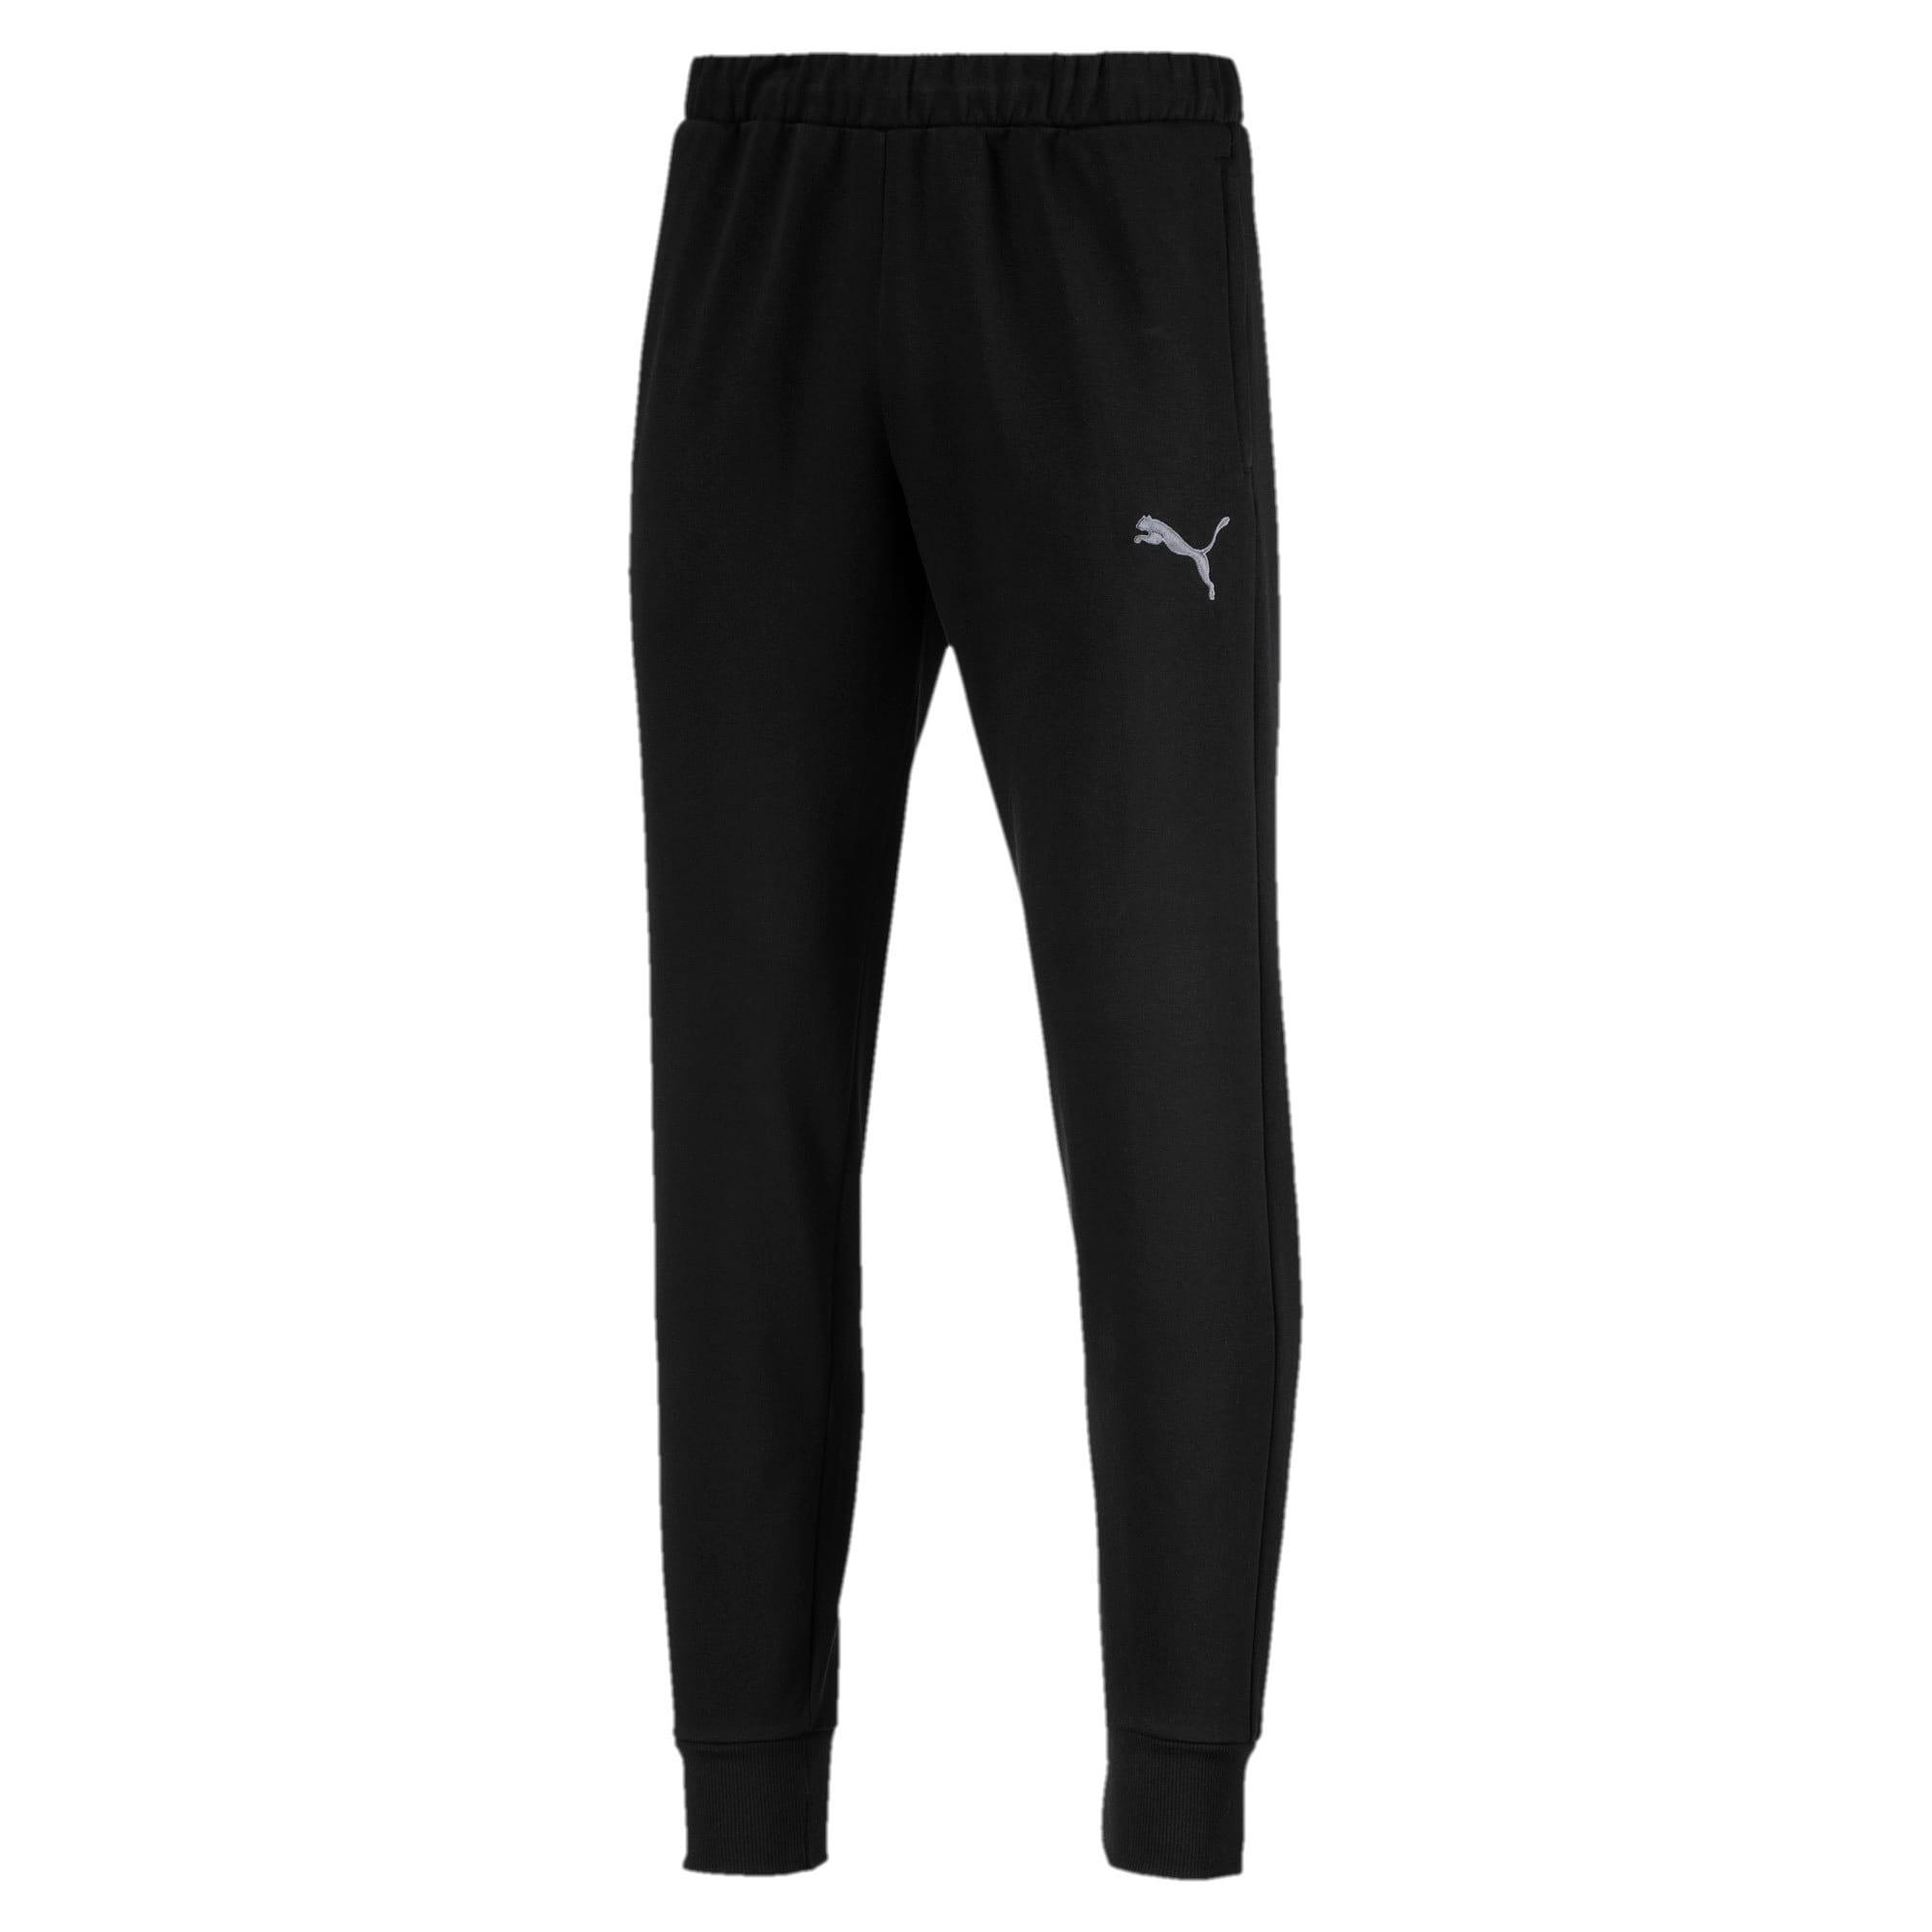 Thumbnail 1 of P48 Modern Sports Pants, Cotton Black, medium